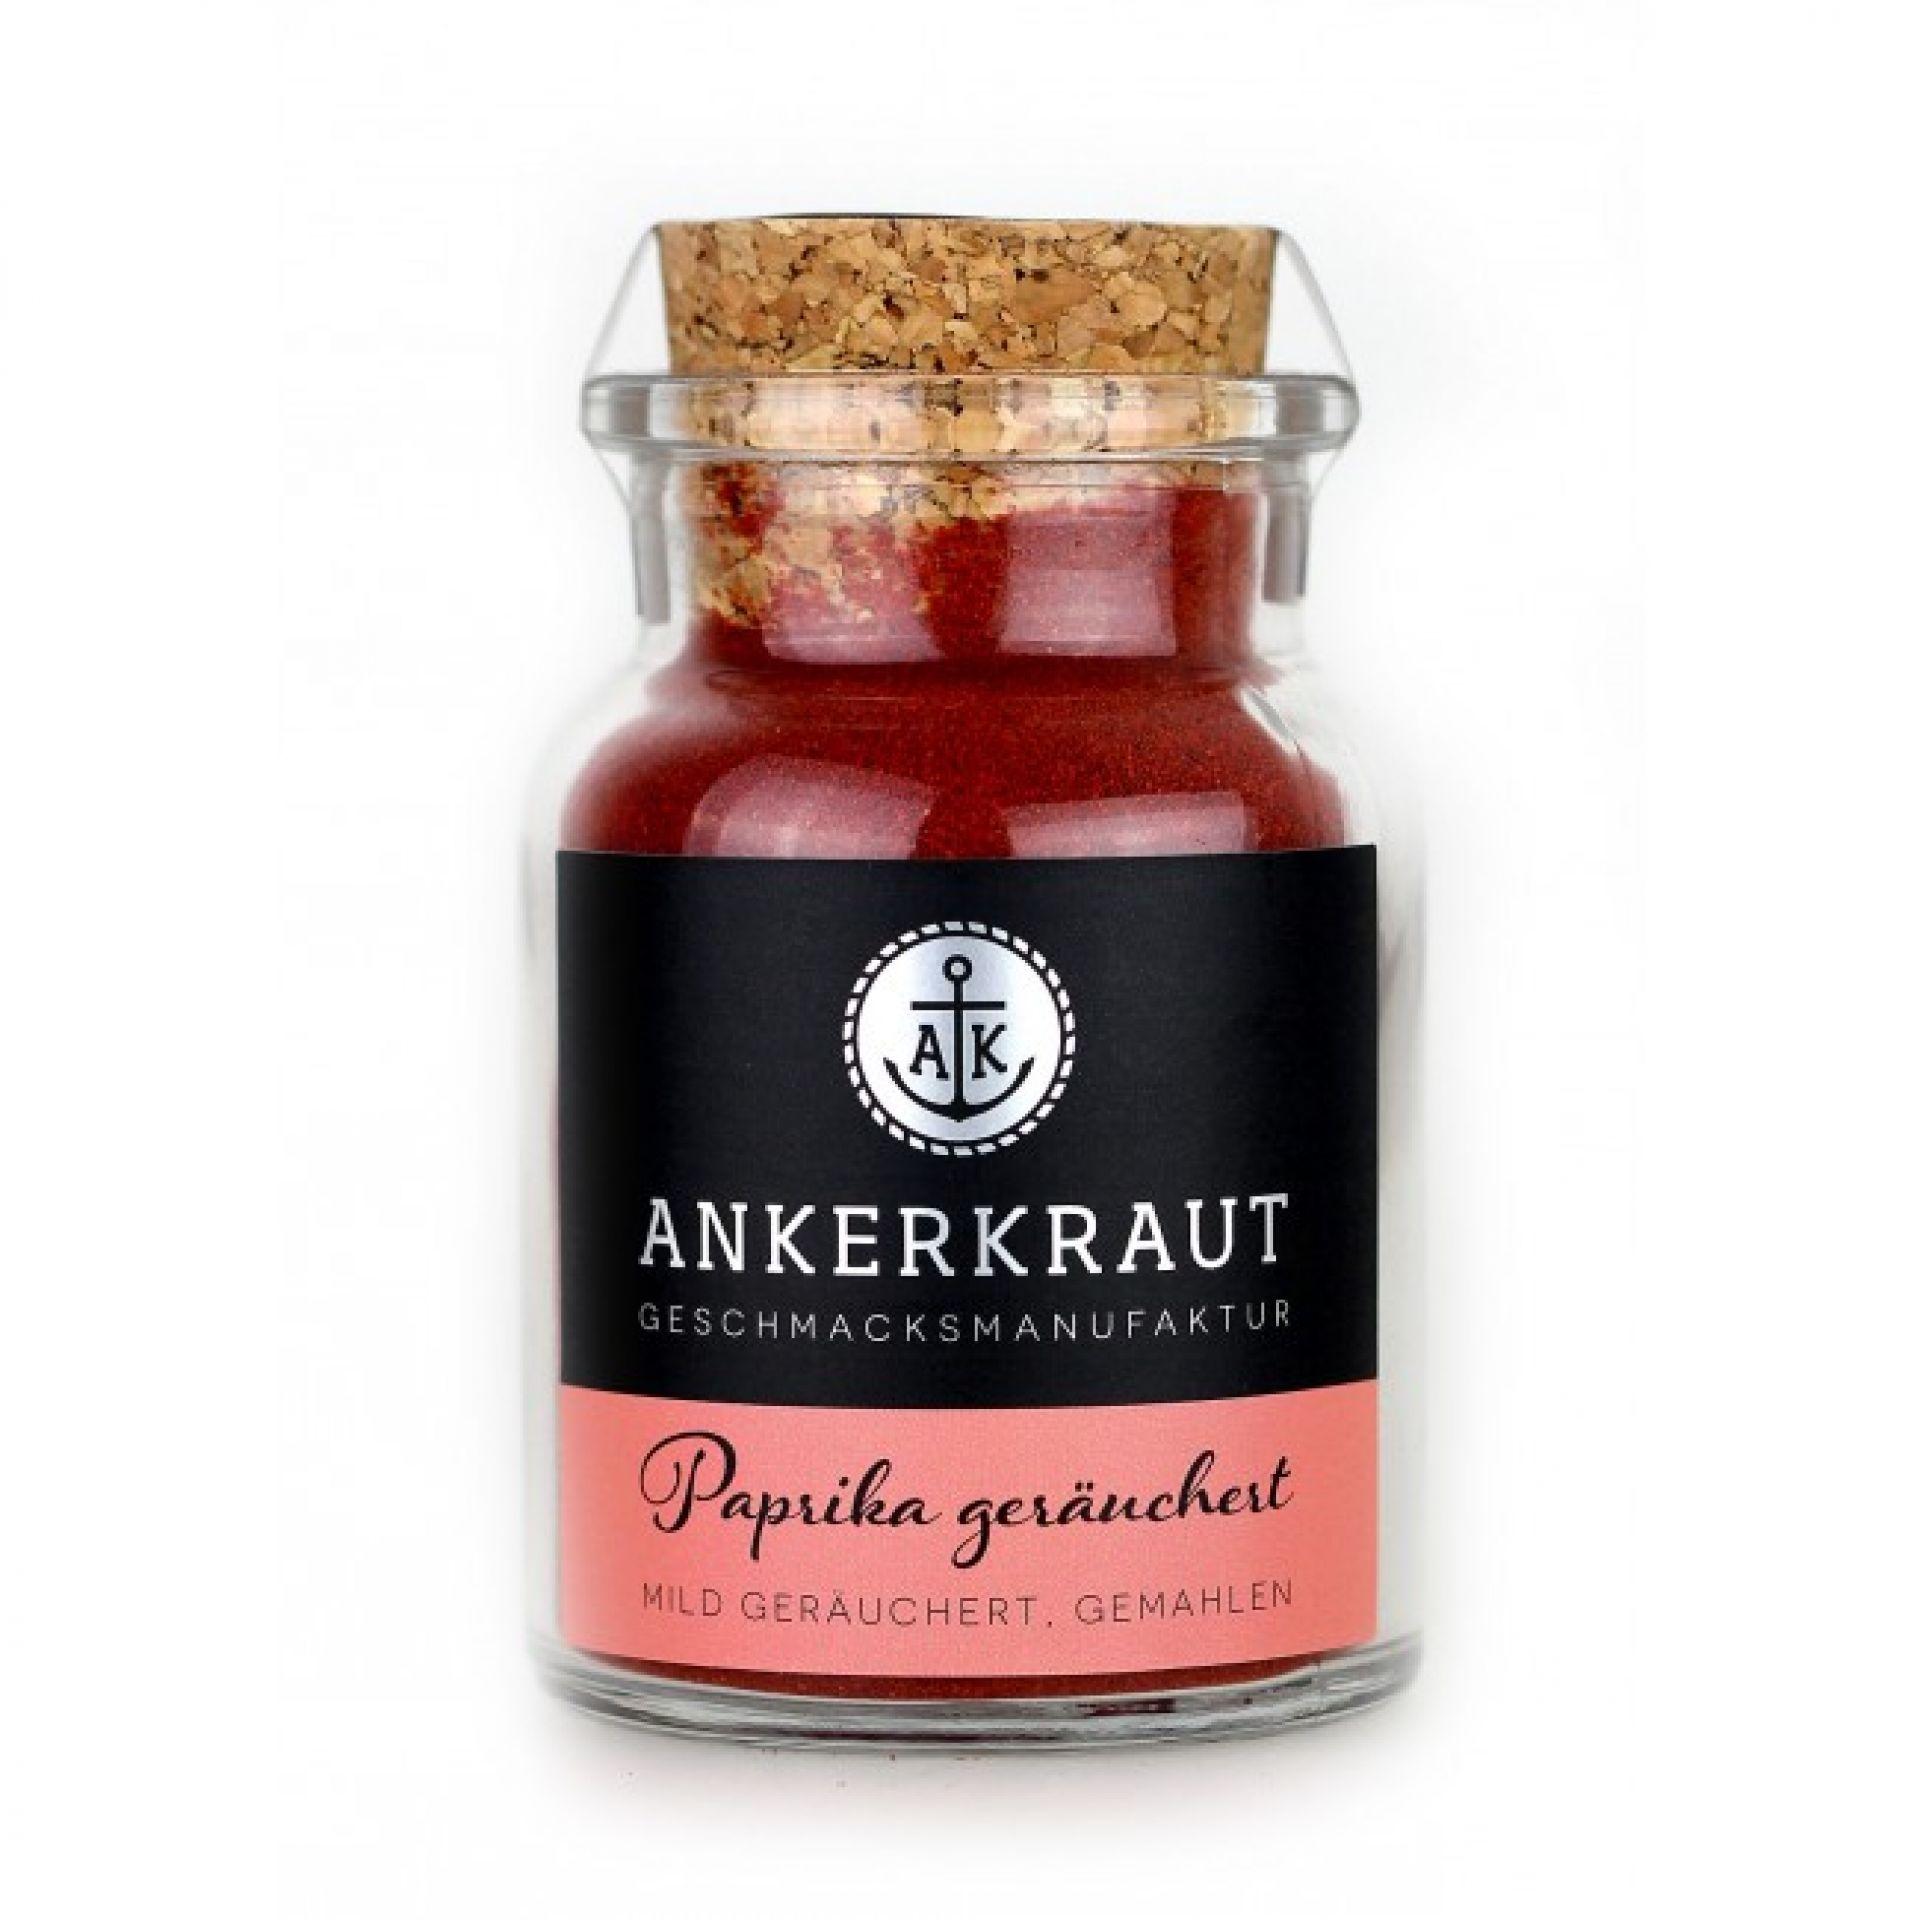 Ankerkraut Paprika geräuchert (Korkenglas) 80g